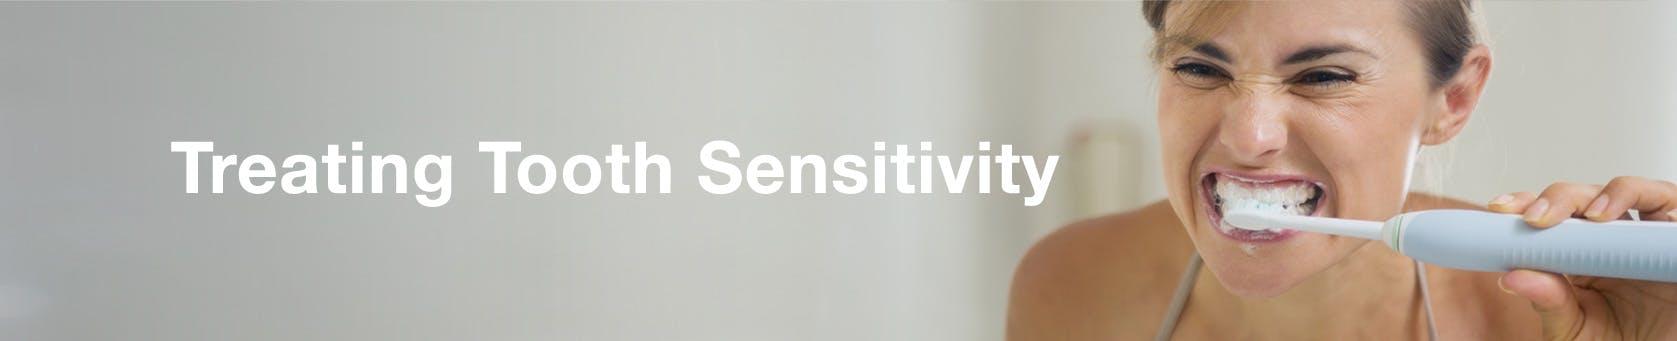 Treating Sensitivity